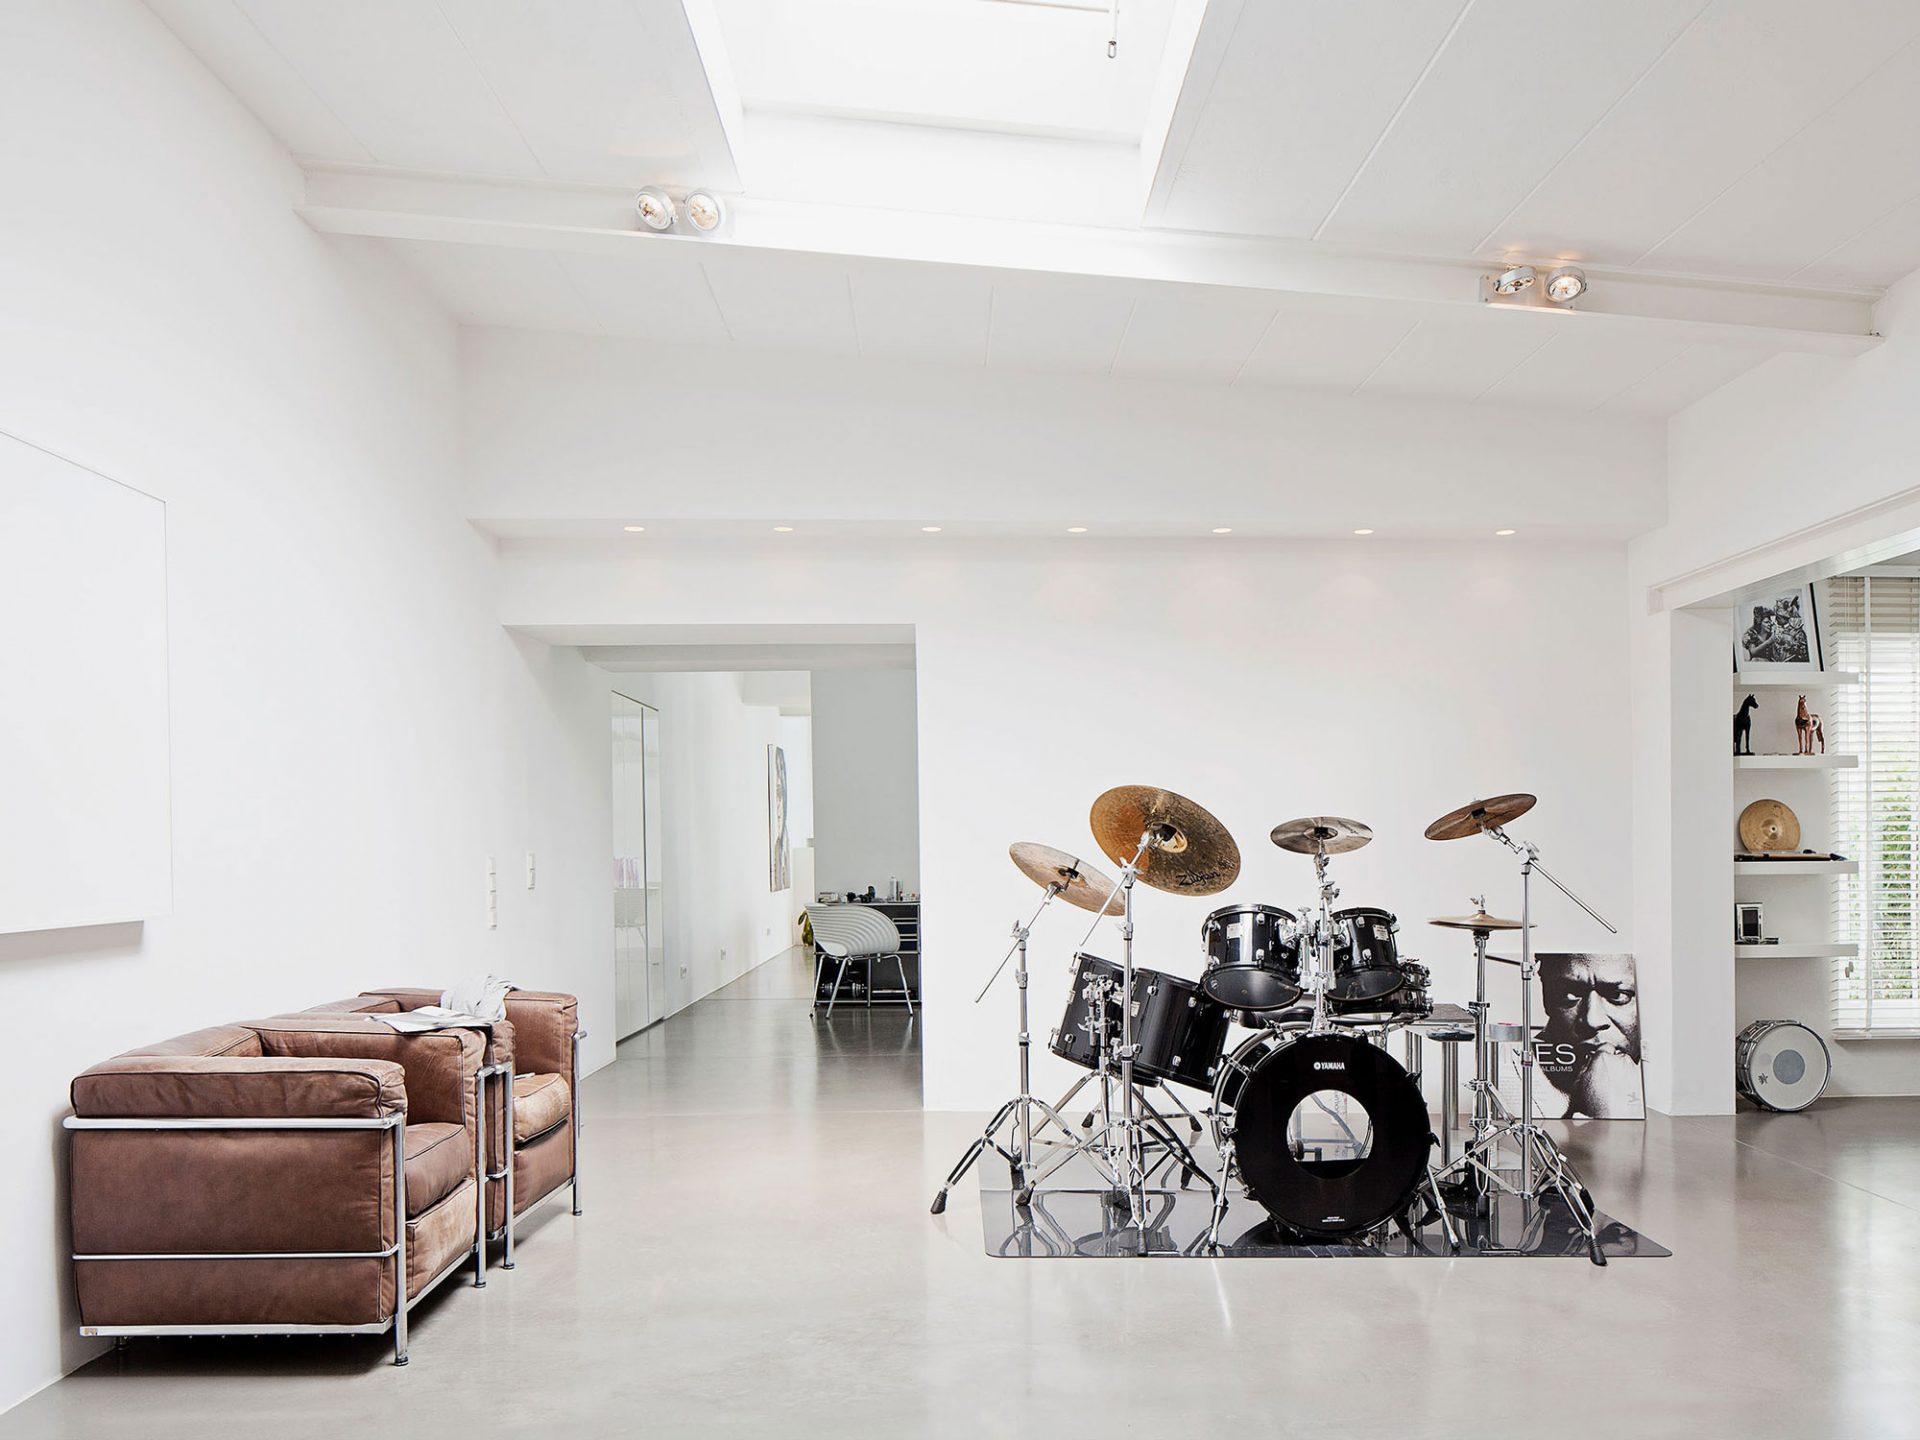 Interiordesign © offenblende.de